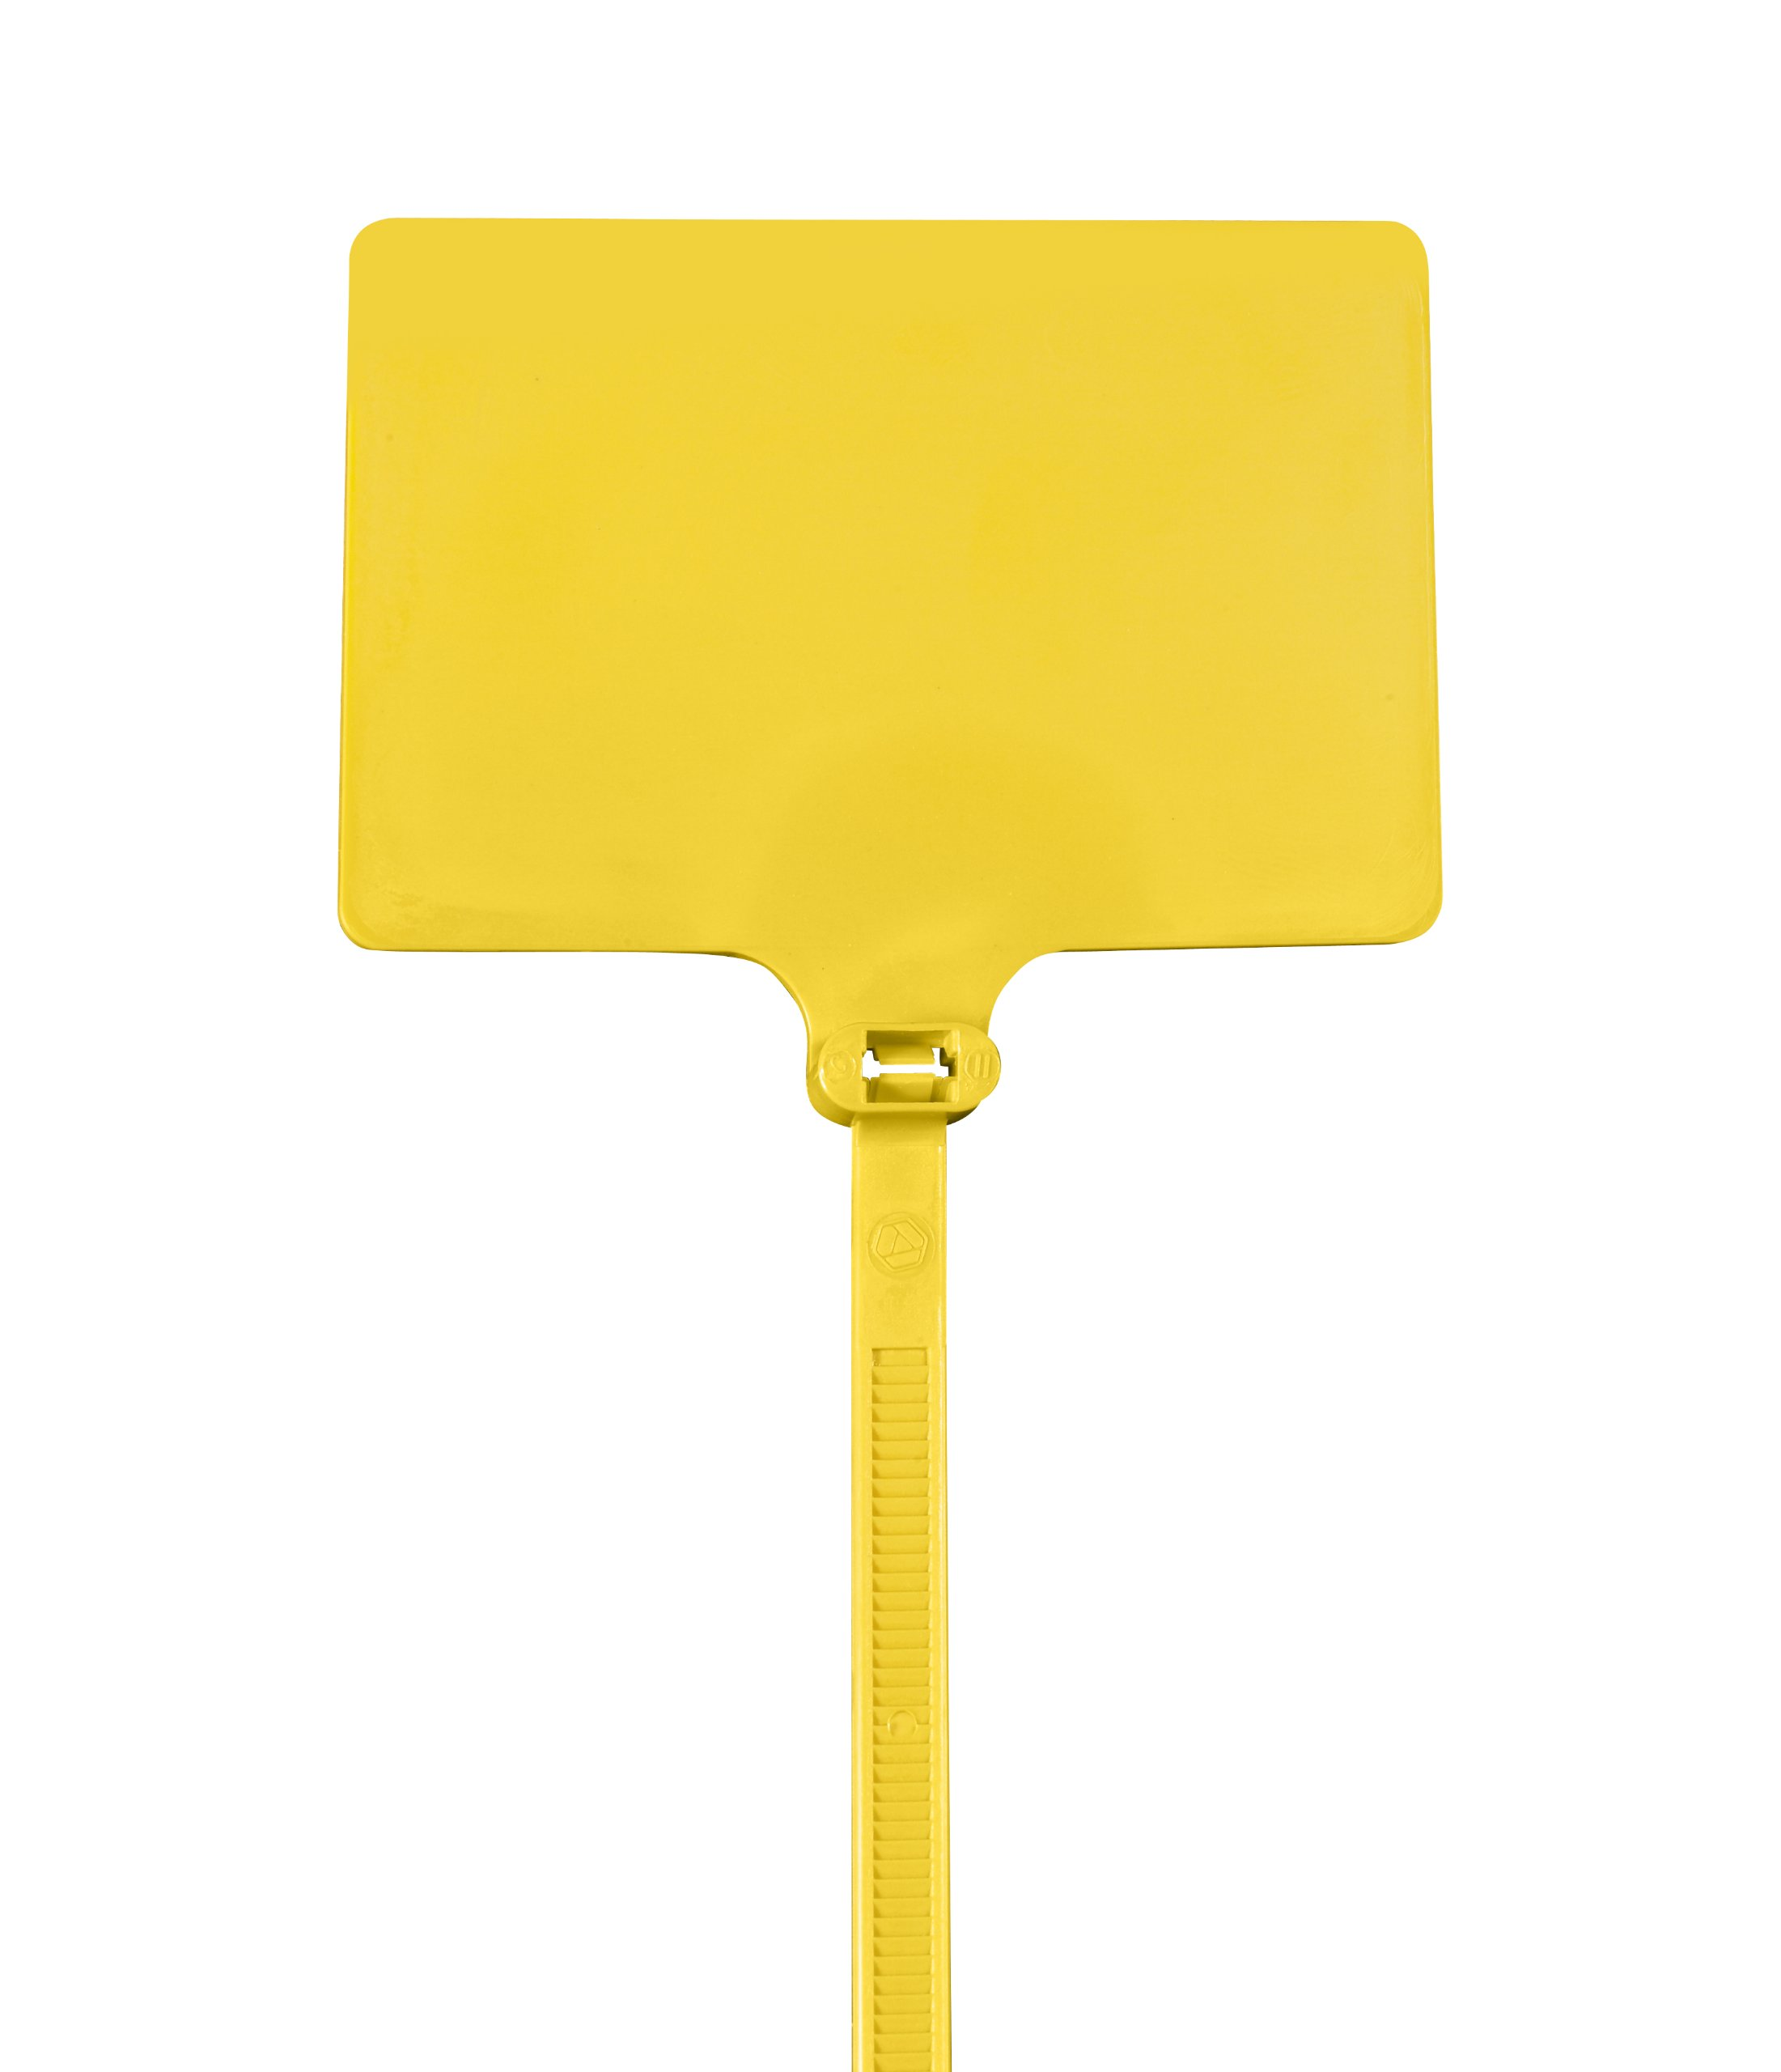 Aviditi Identification Cable Tie, 9'' L x 1/4'' W, 120 lb Tensile Strength, Yellow, Case of 100 (CTID86)